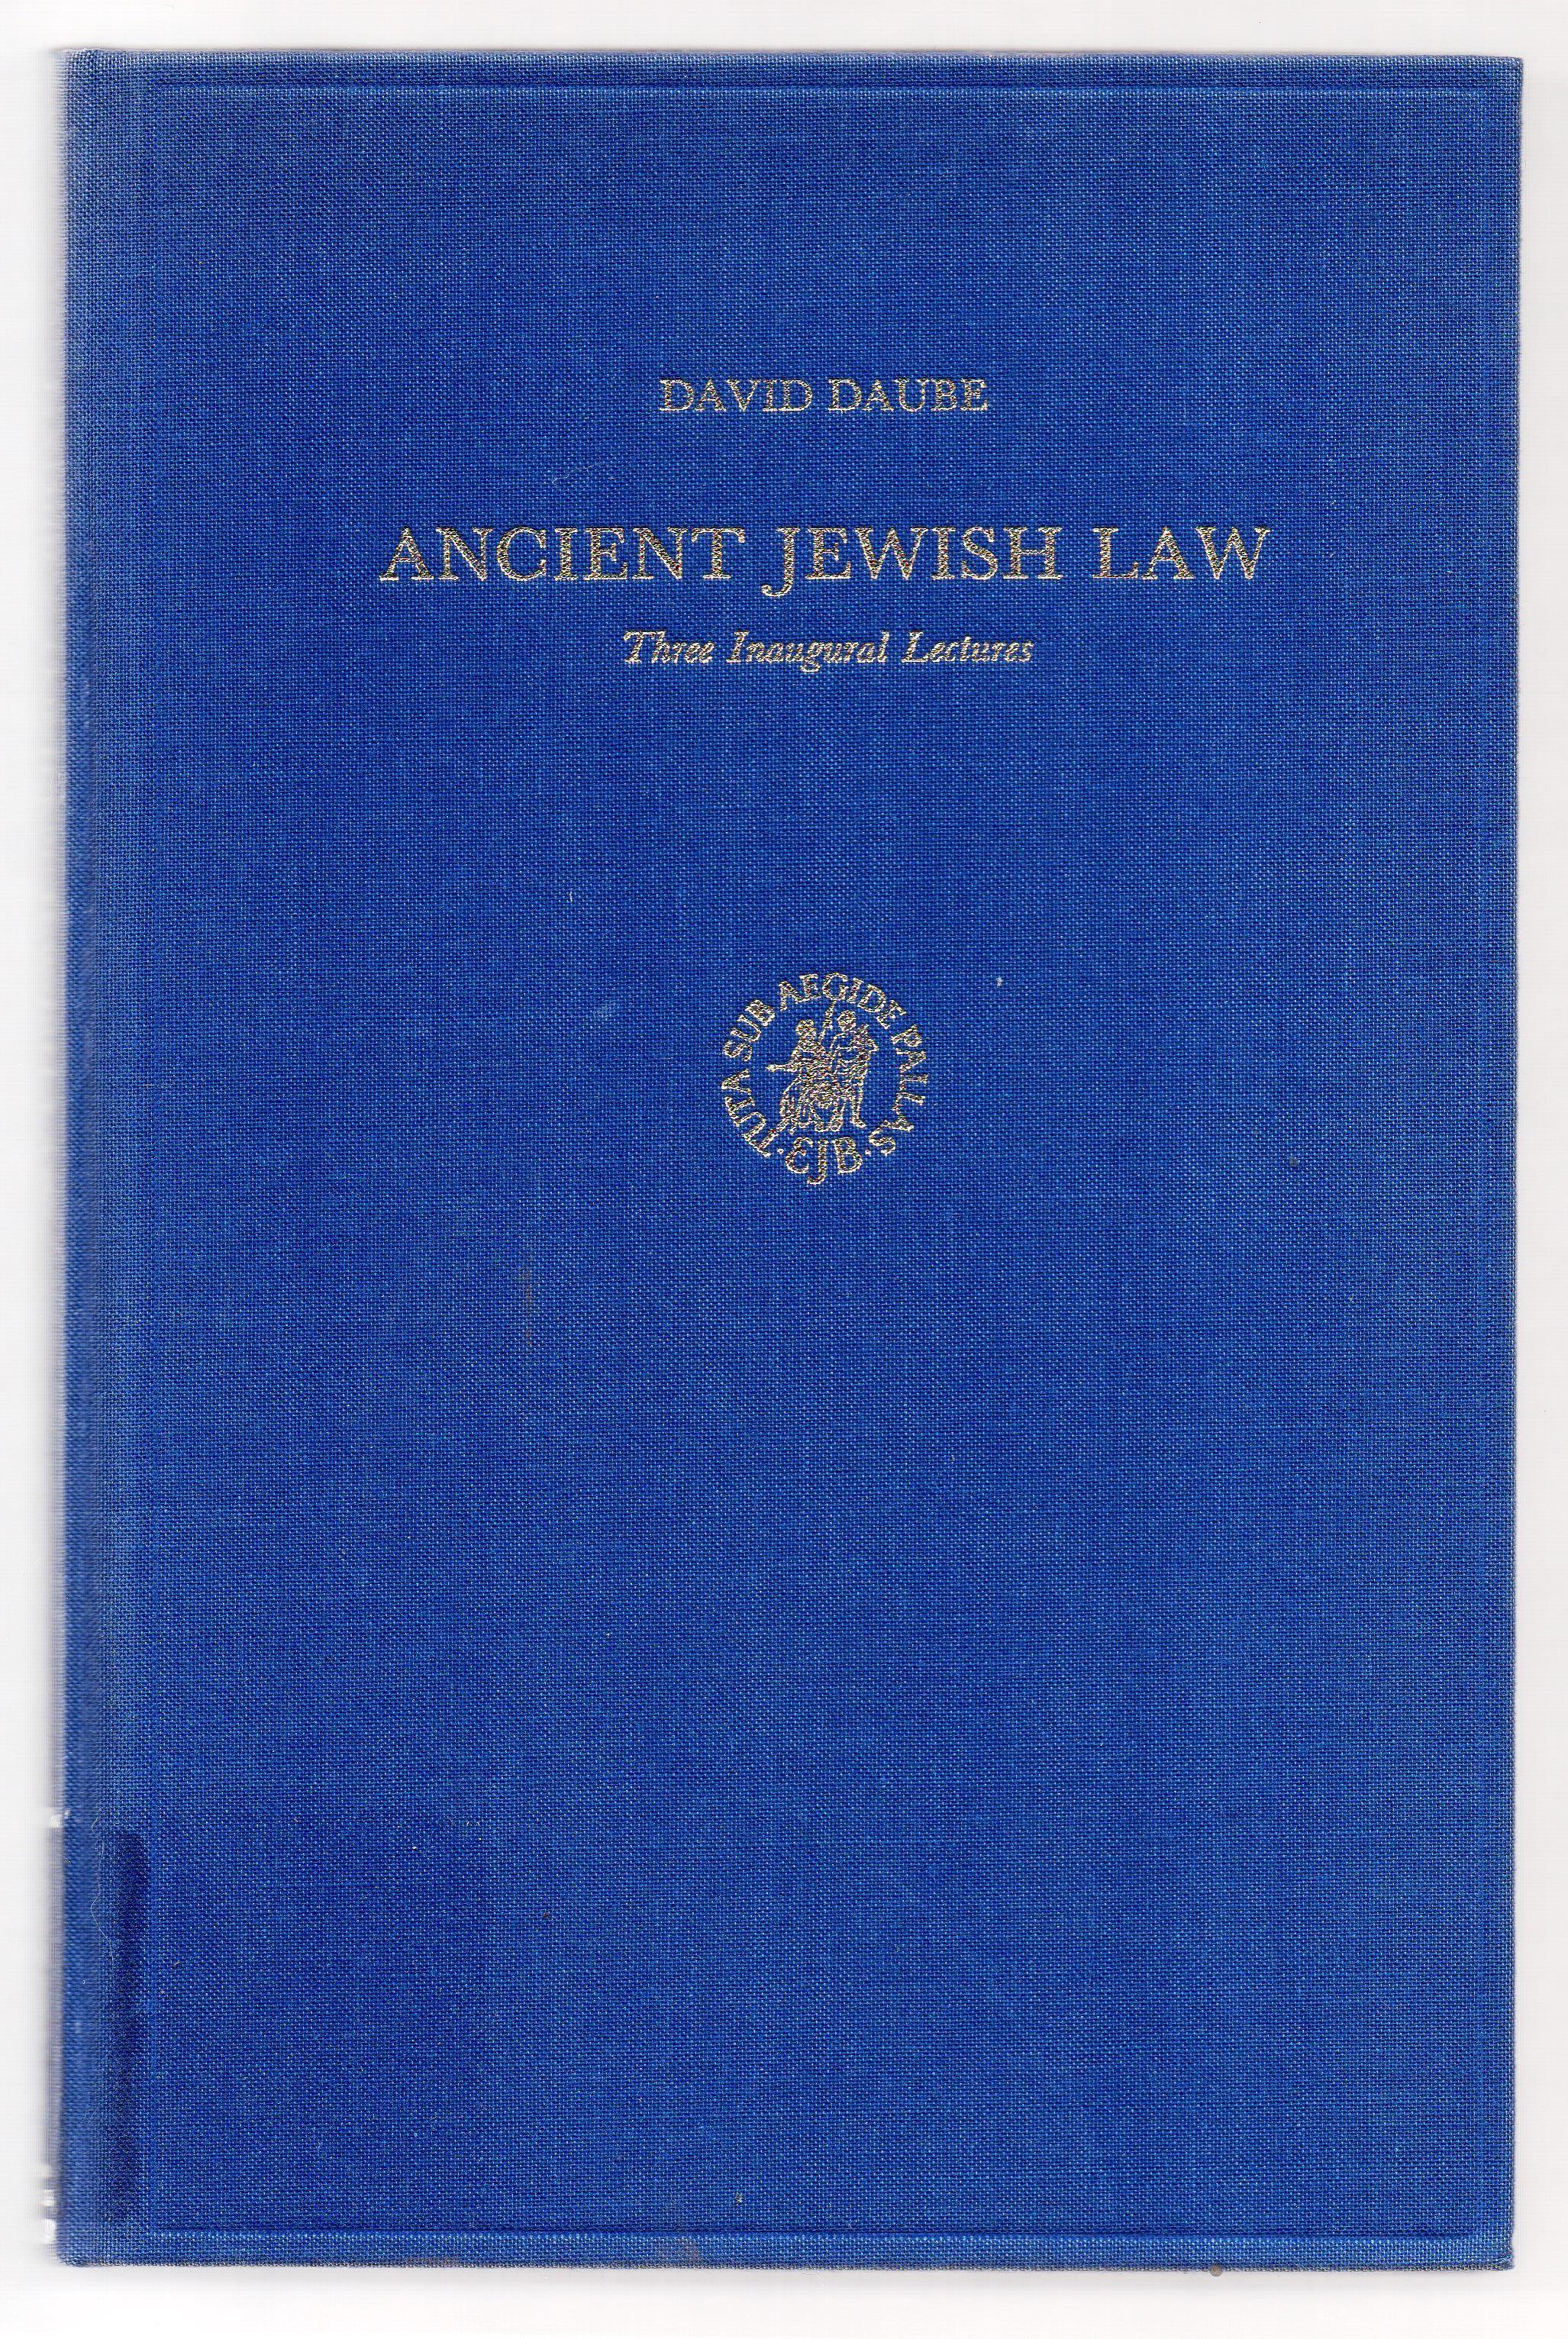 Ancient Jewish Law Three Inaugural Lectures By David